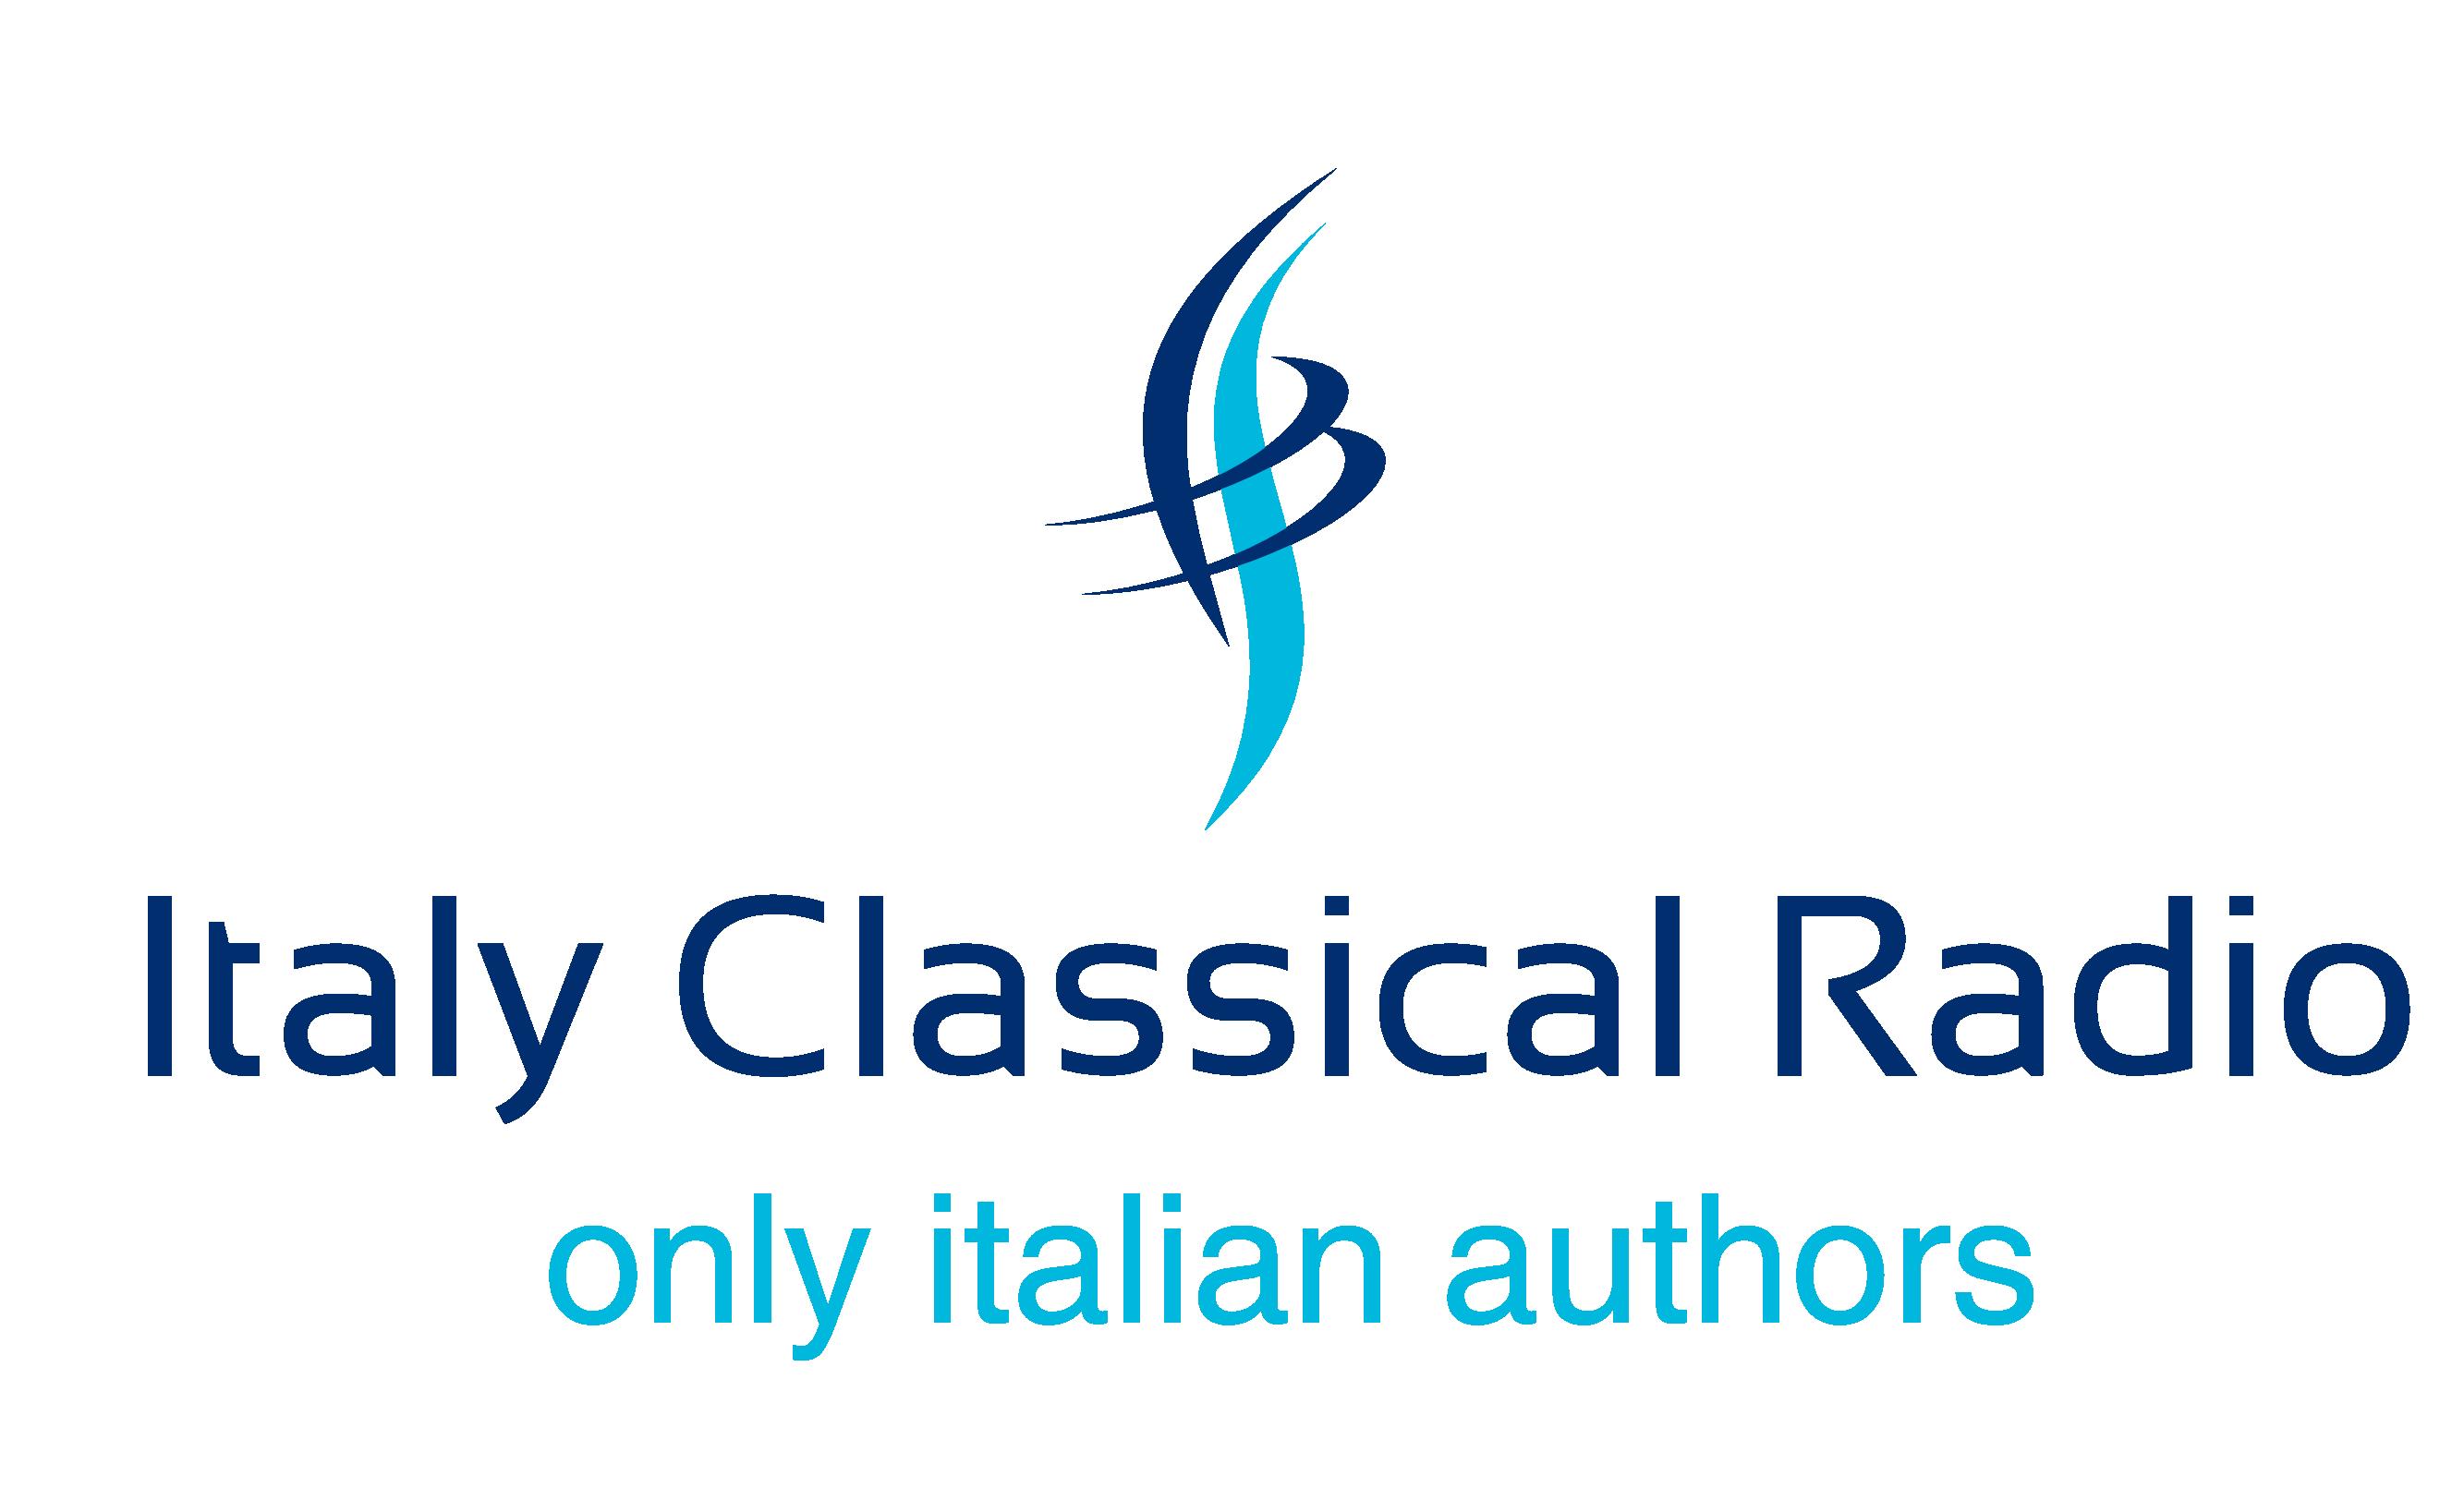 ItalyClassicalRadio